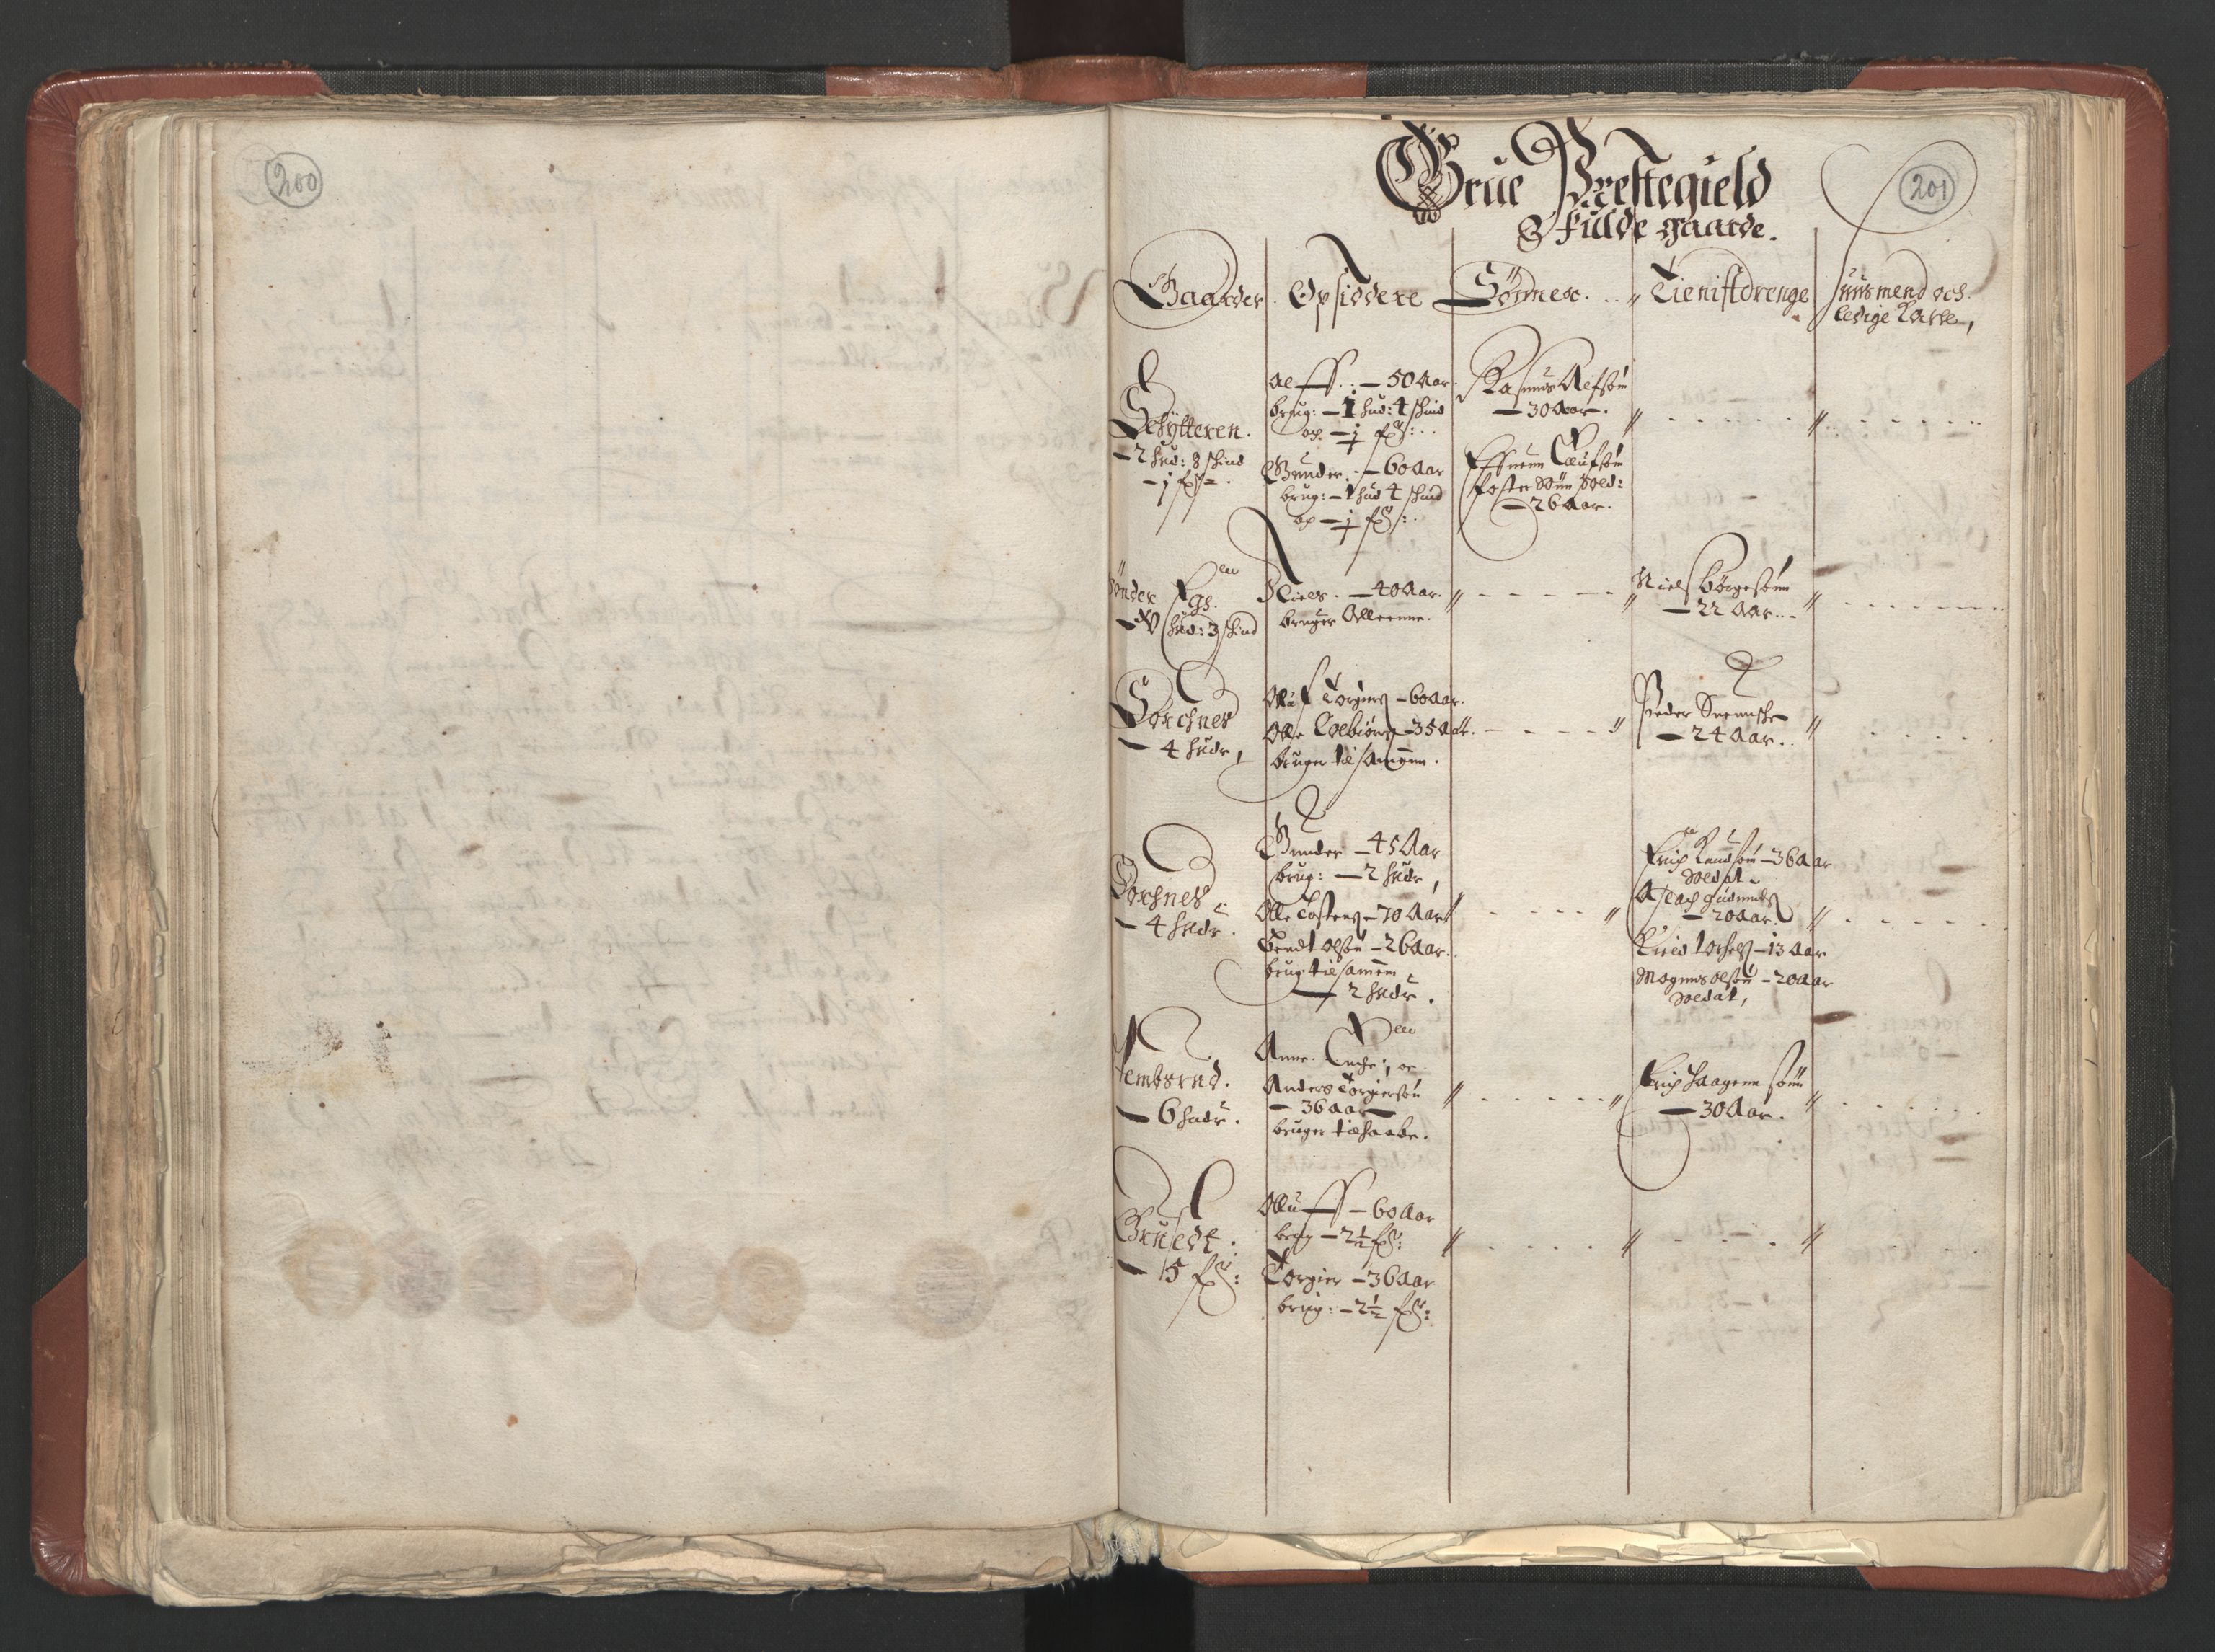 RA, Fogdenes og sorenskrivernes manntall 1664-1666, nr. 3: Hedmark fogderi og Solør, Østerdal og Odal fogderi, 1664, s. 200-201